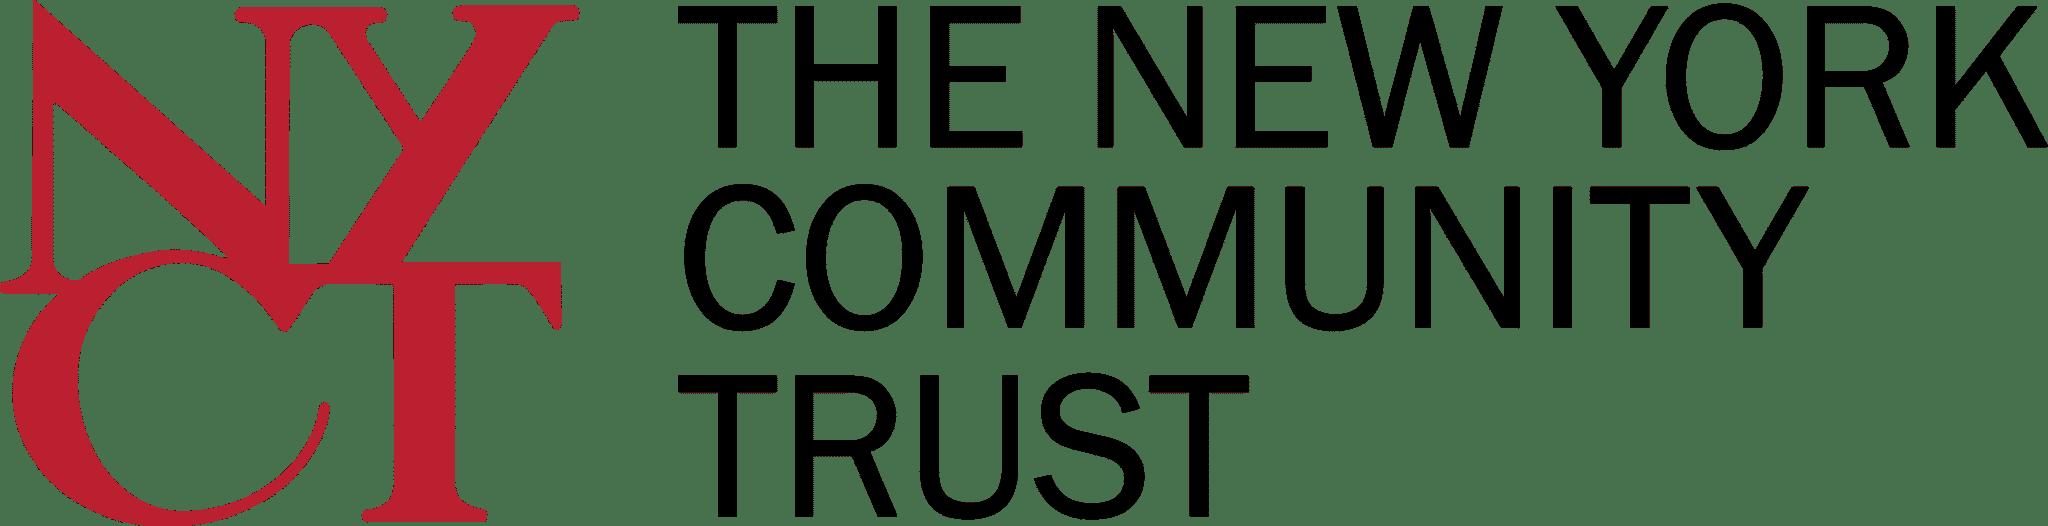 The New York Community Trust Logo